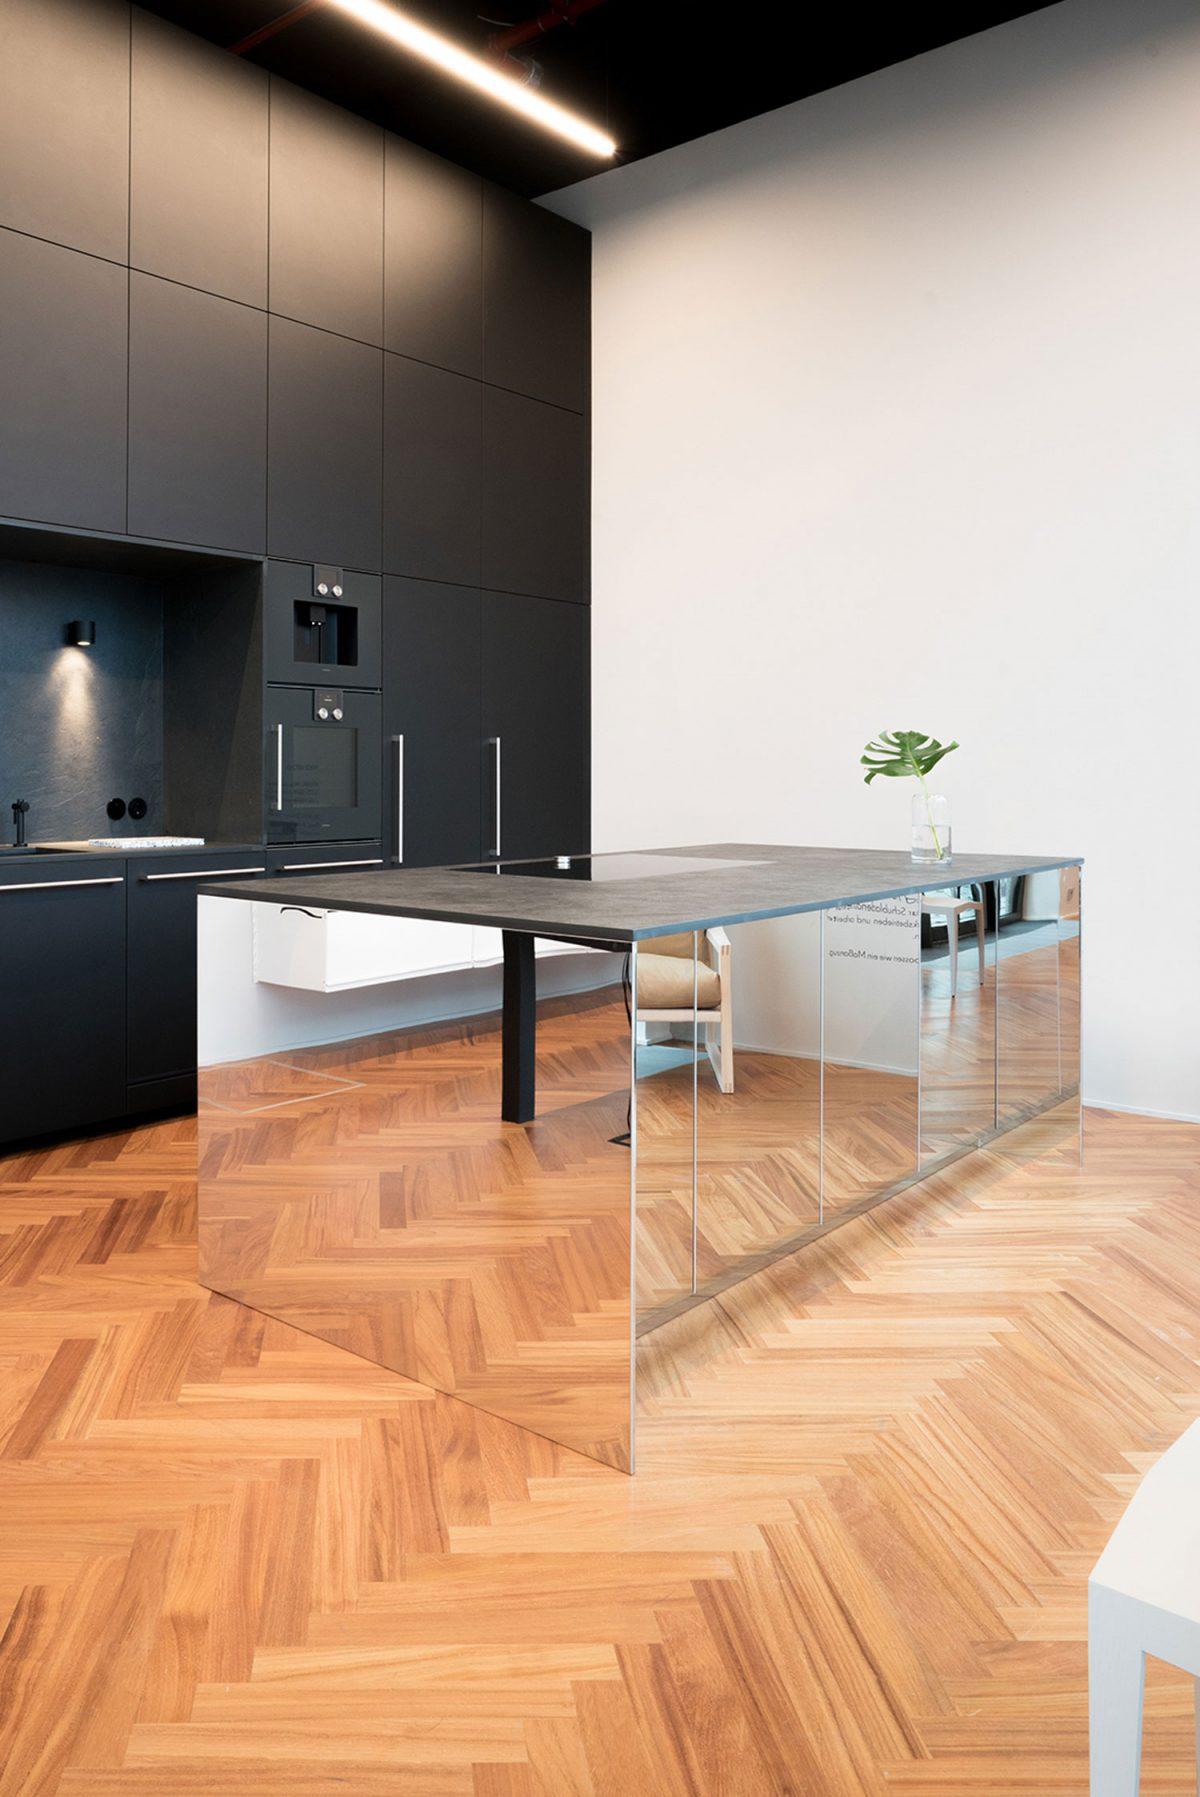 Kücheninsel - Edelstahl